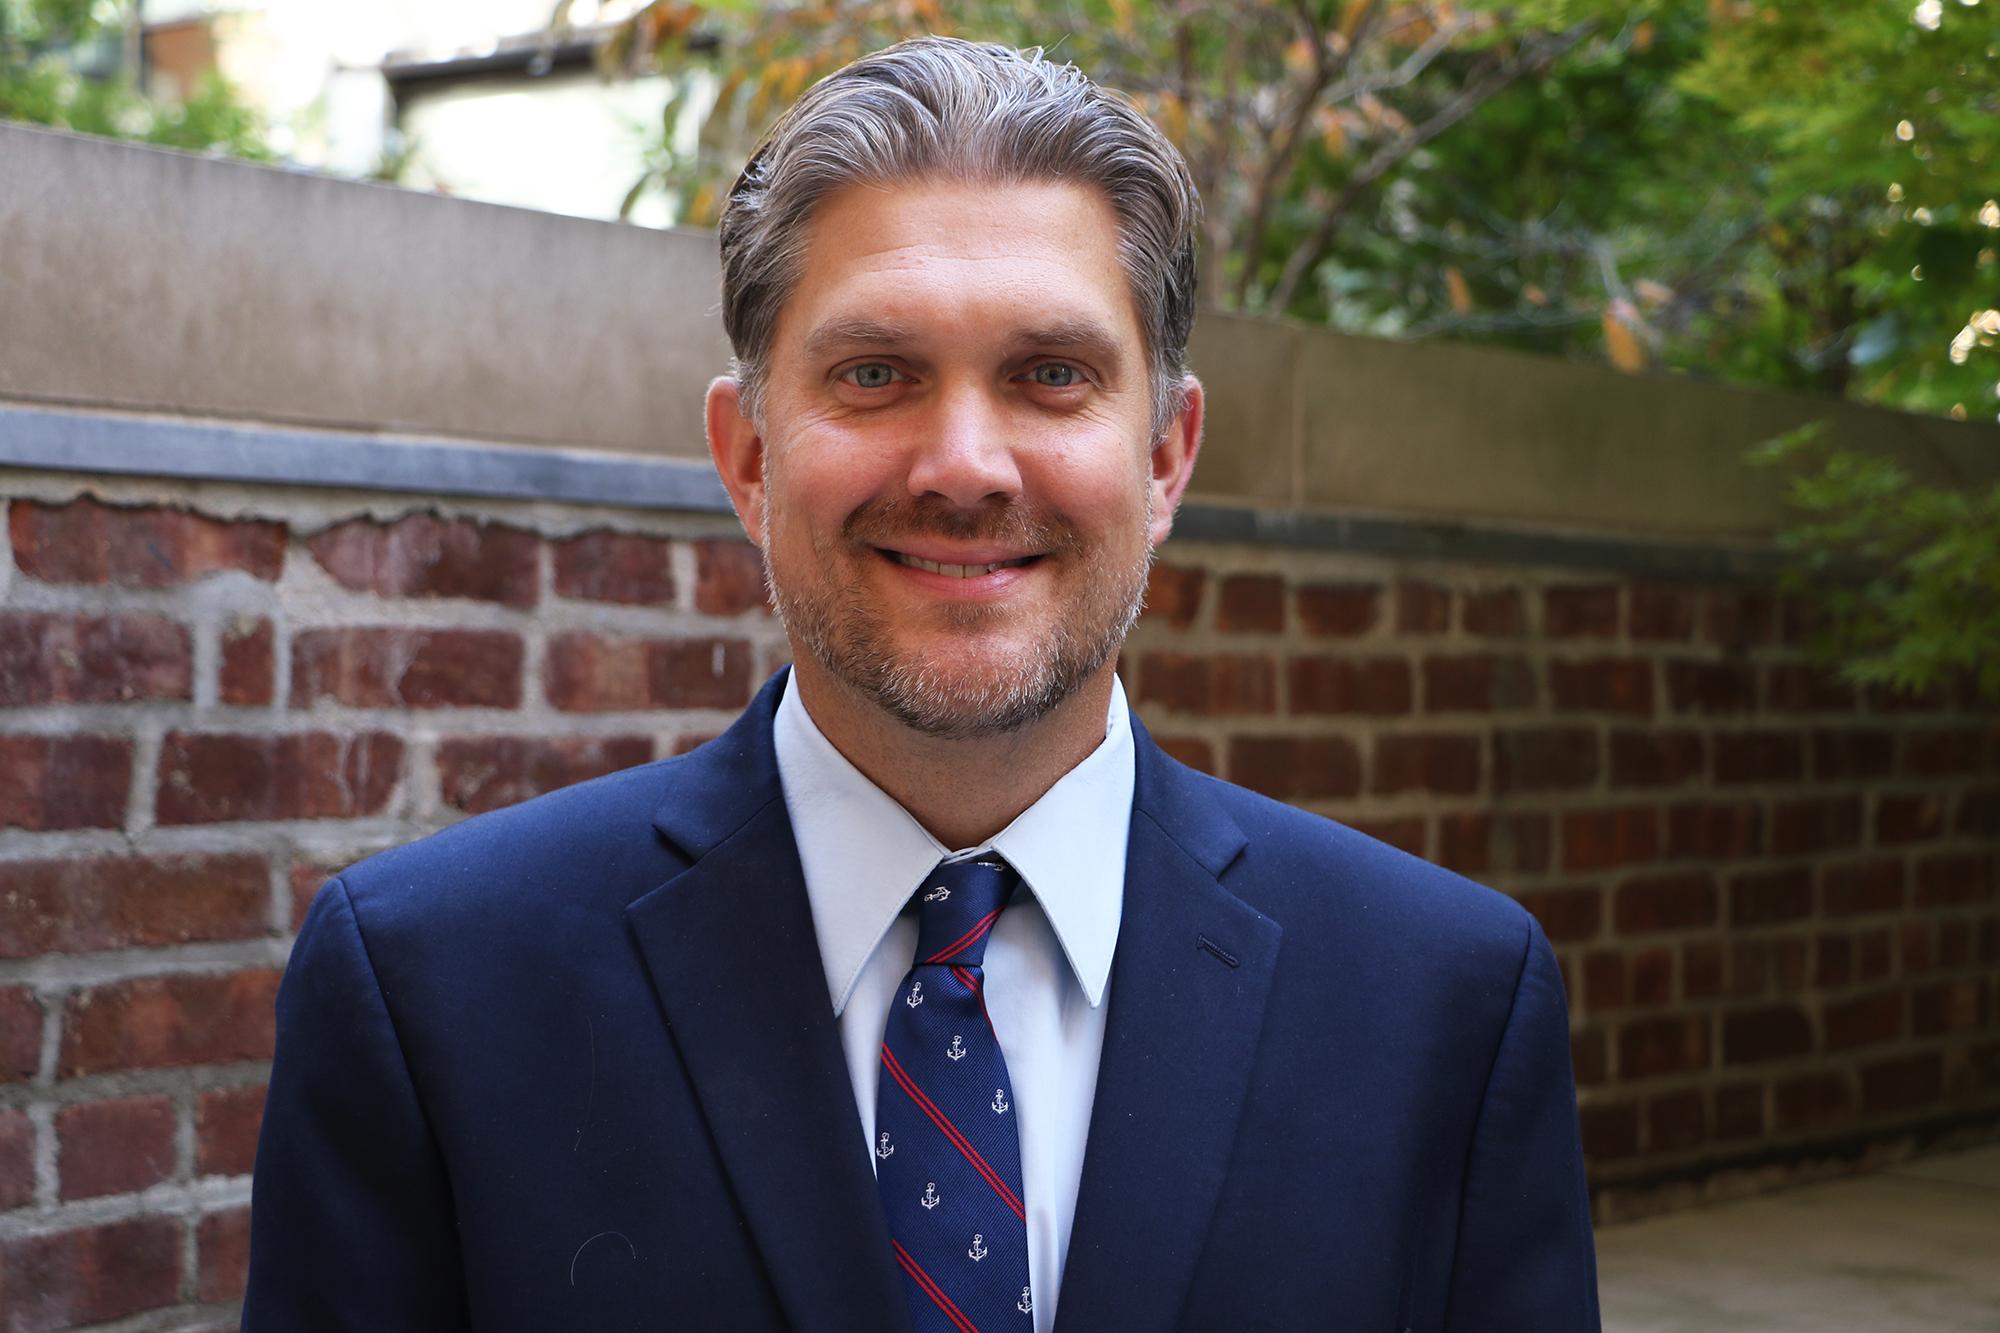 Jeffrey Chetirko